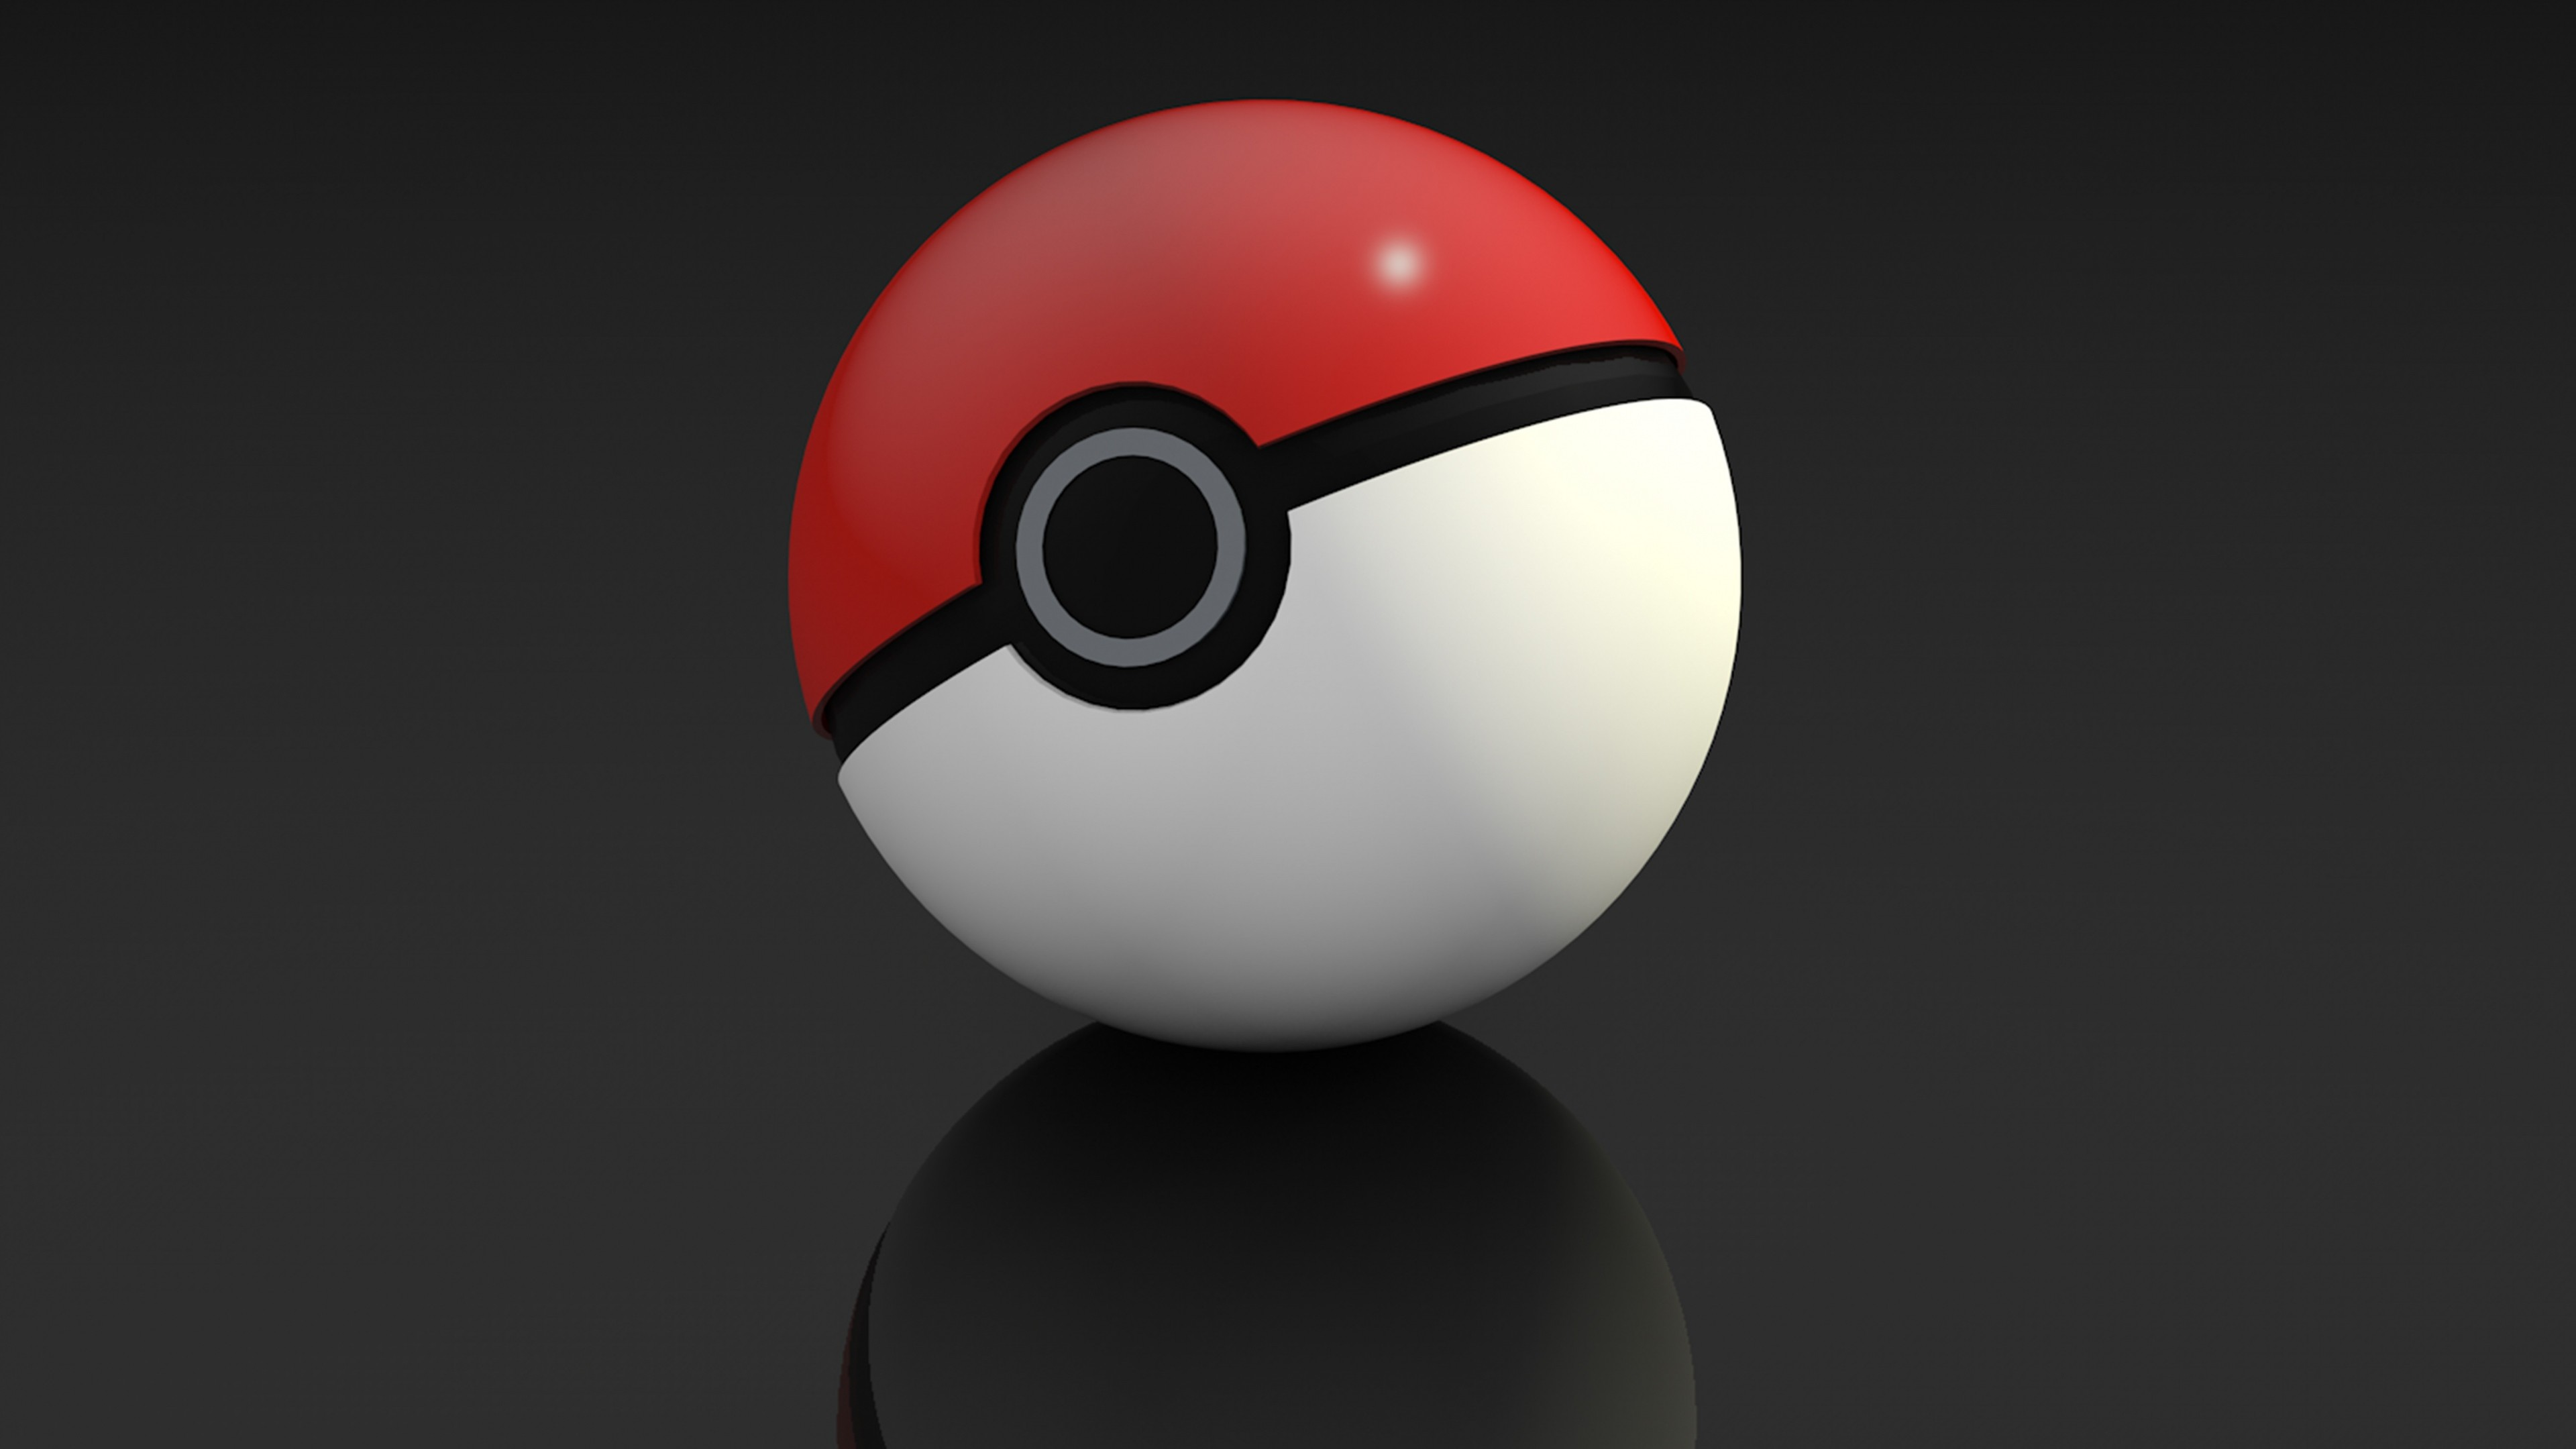 Wallpaper pokemon go, pokebol, game, 3d